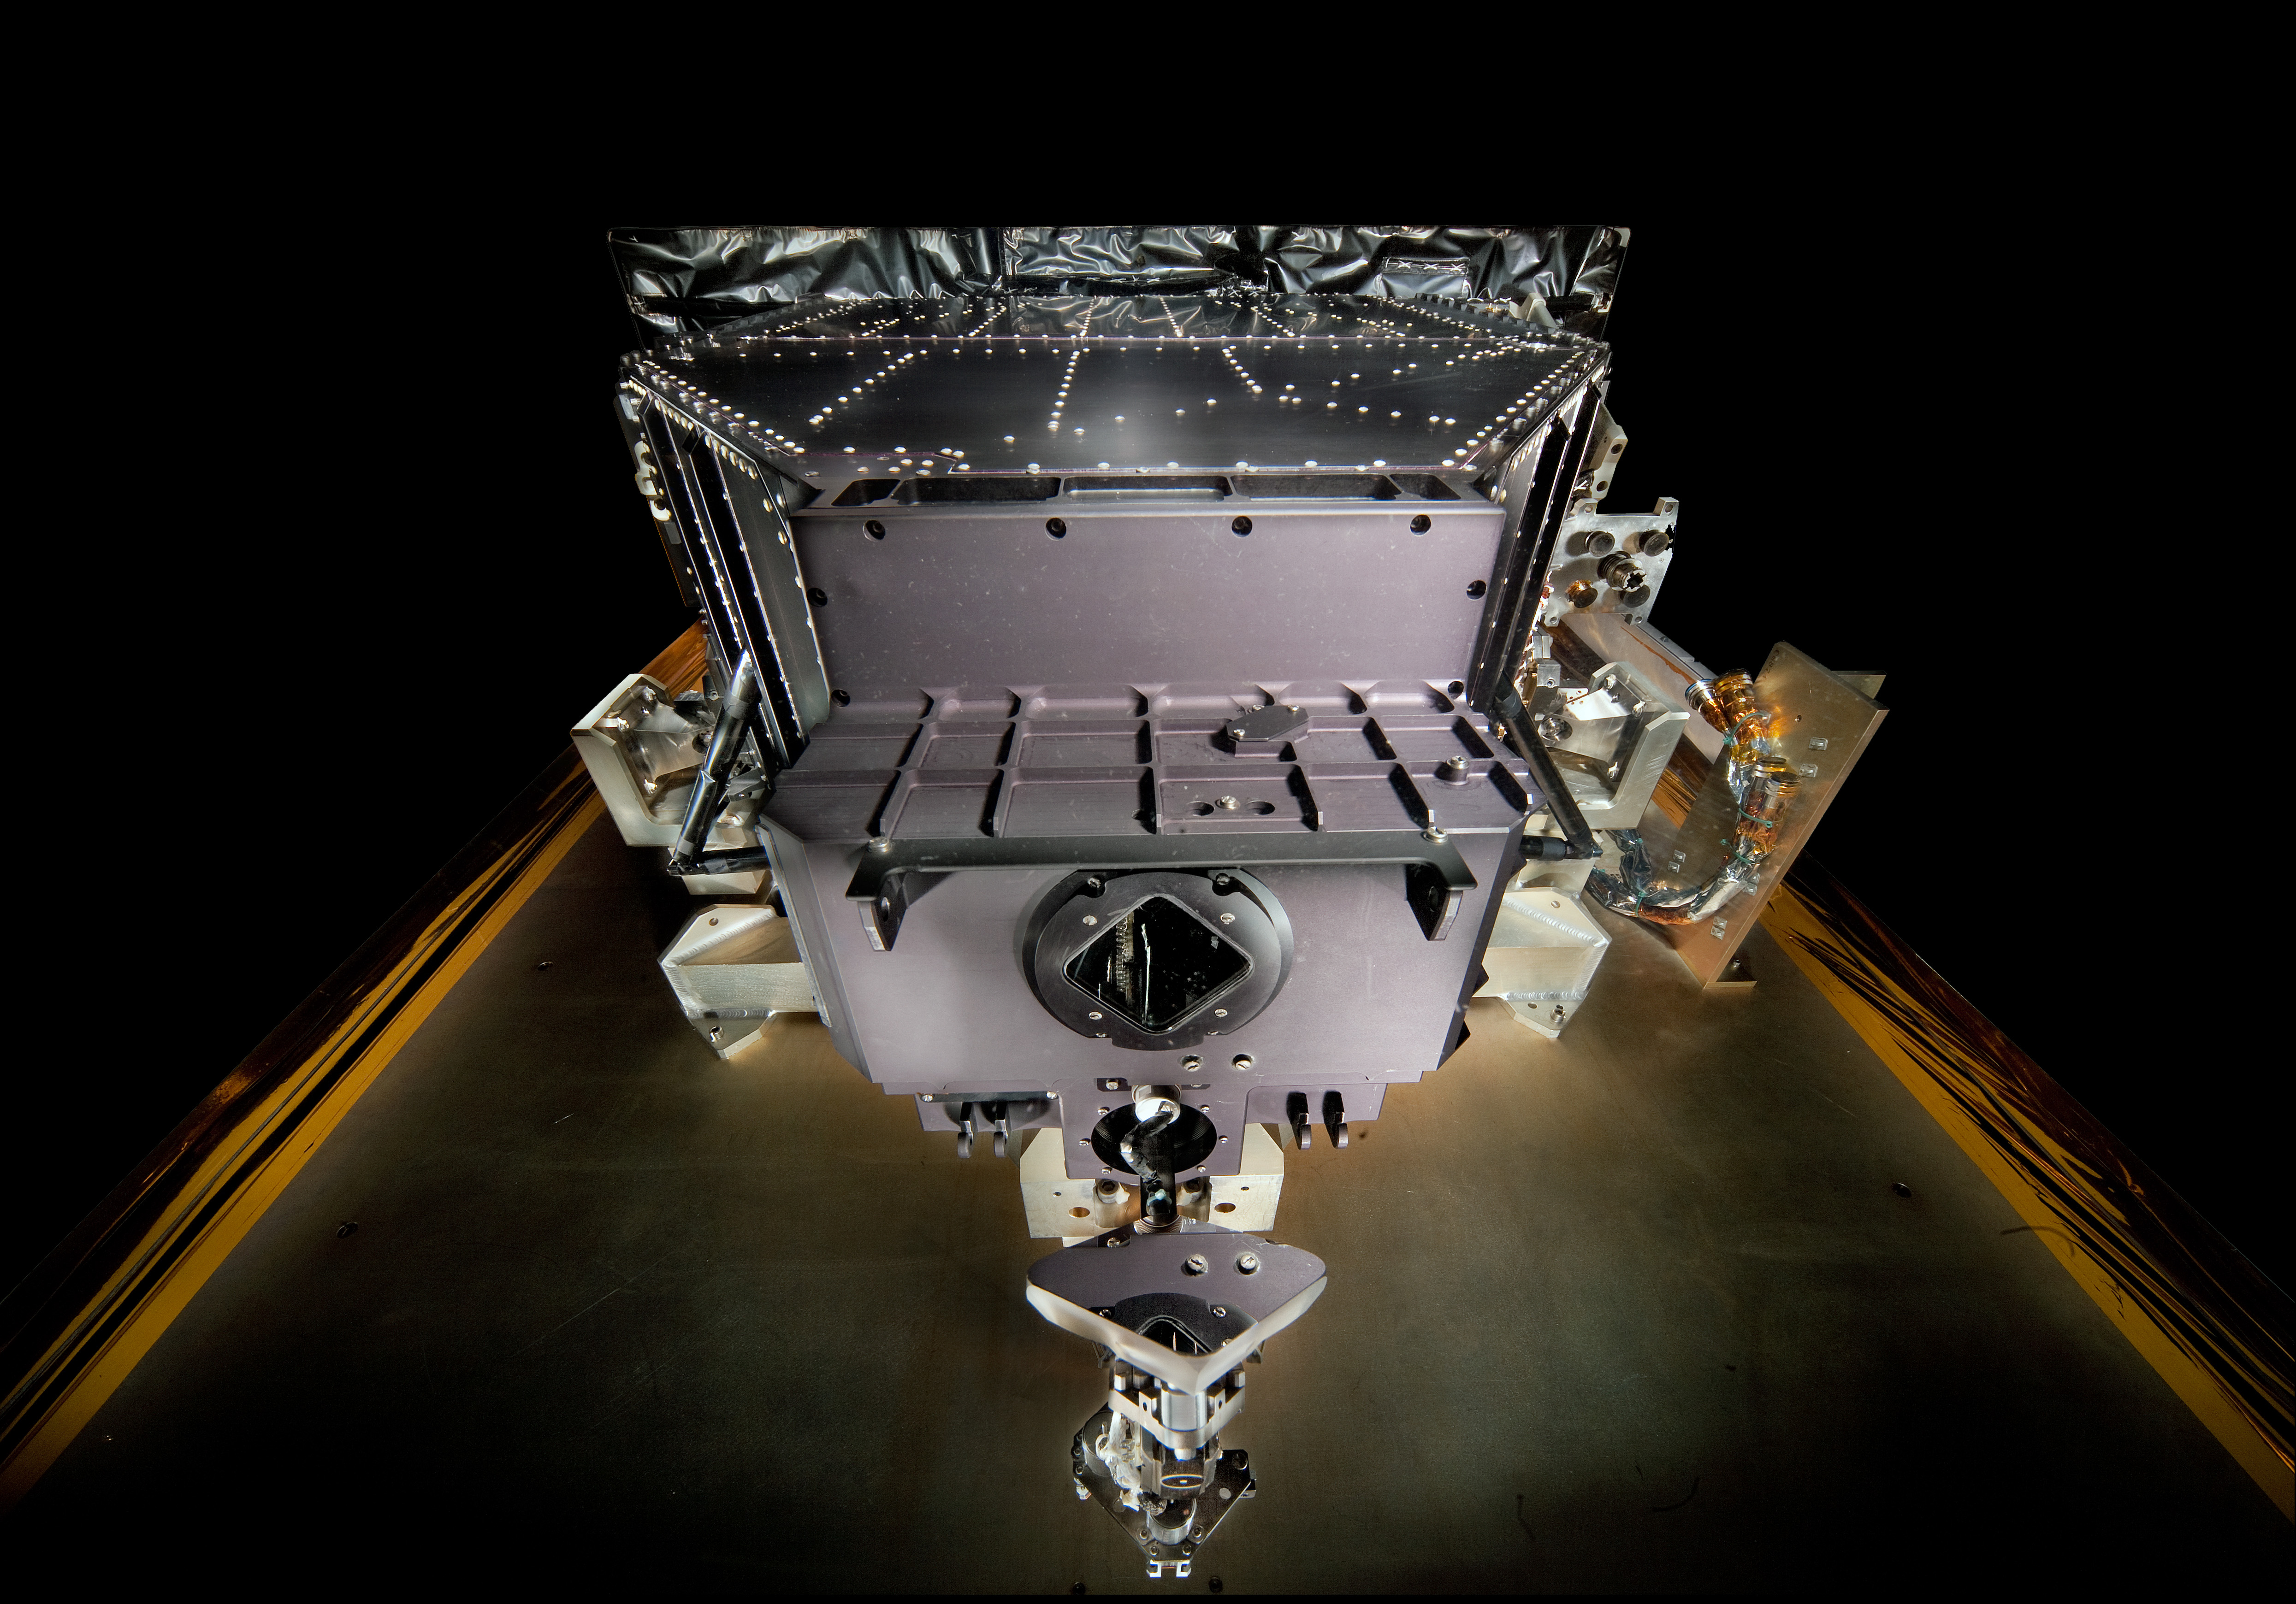 HST Wide Field Planetary Camera 2